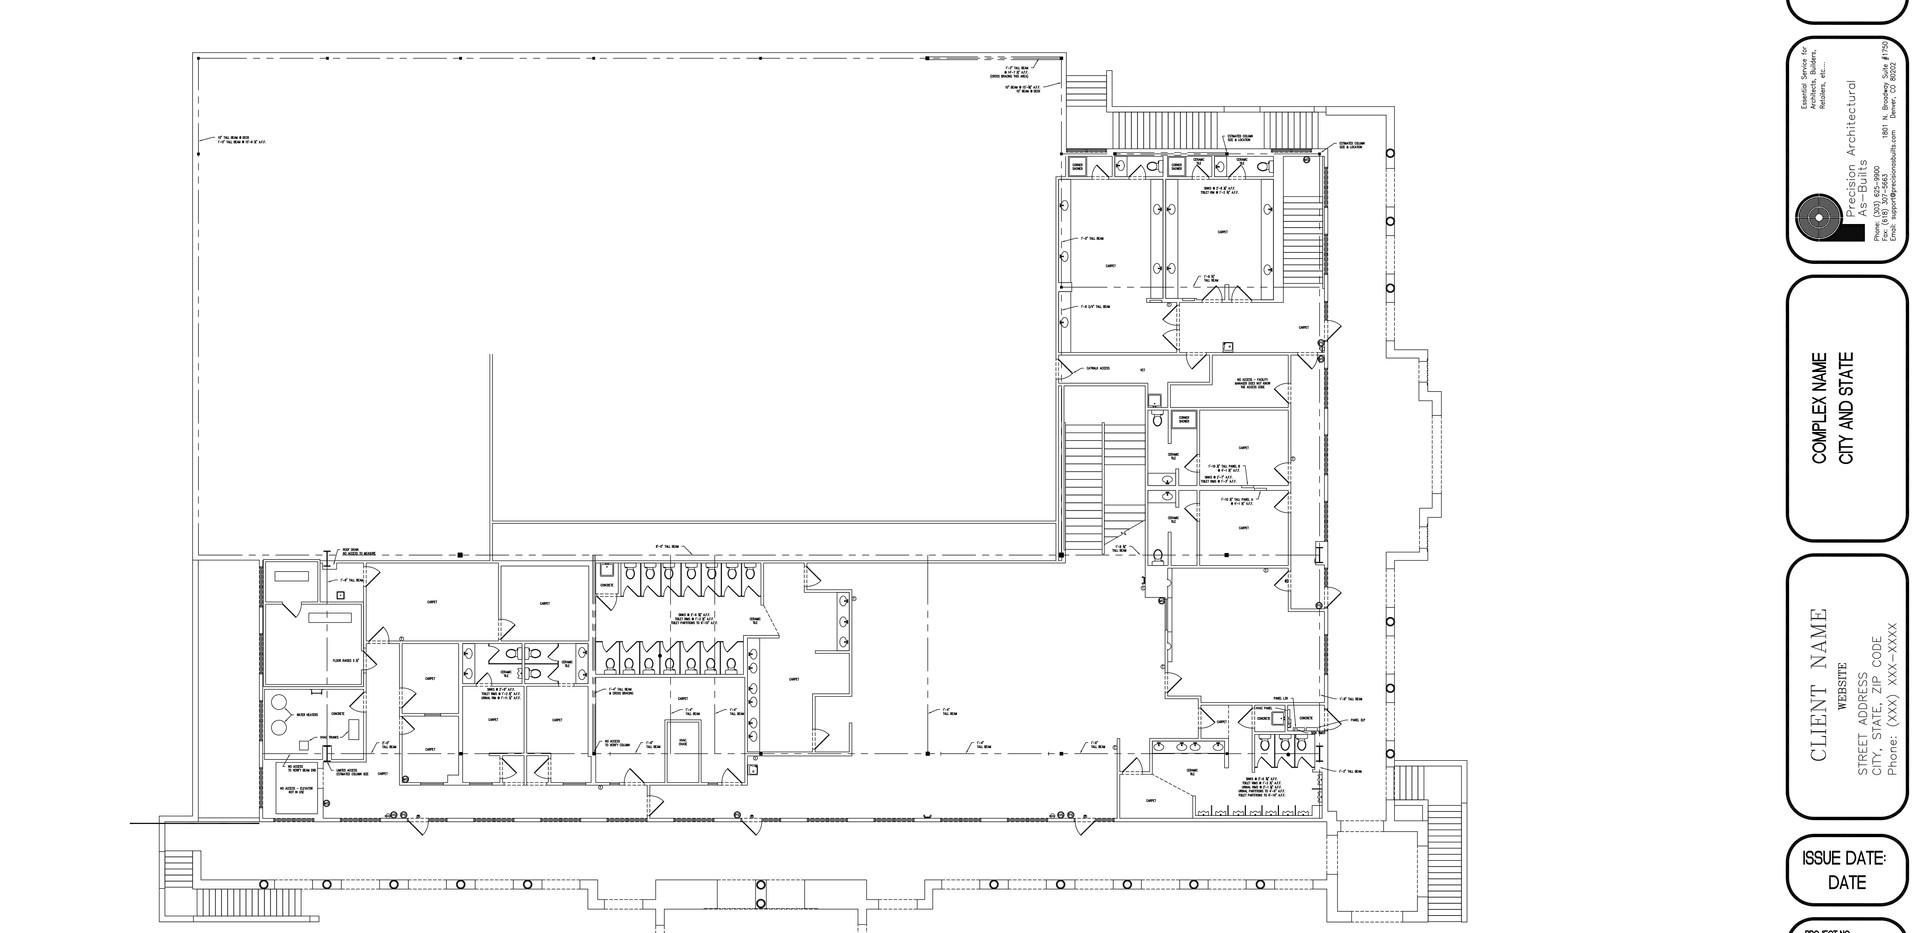 Upper Level Floor Plan A1.1